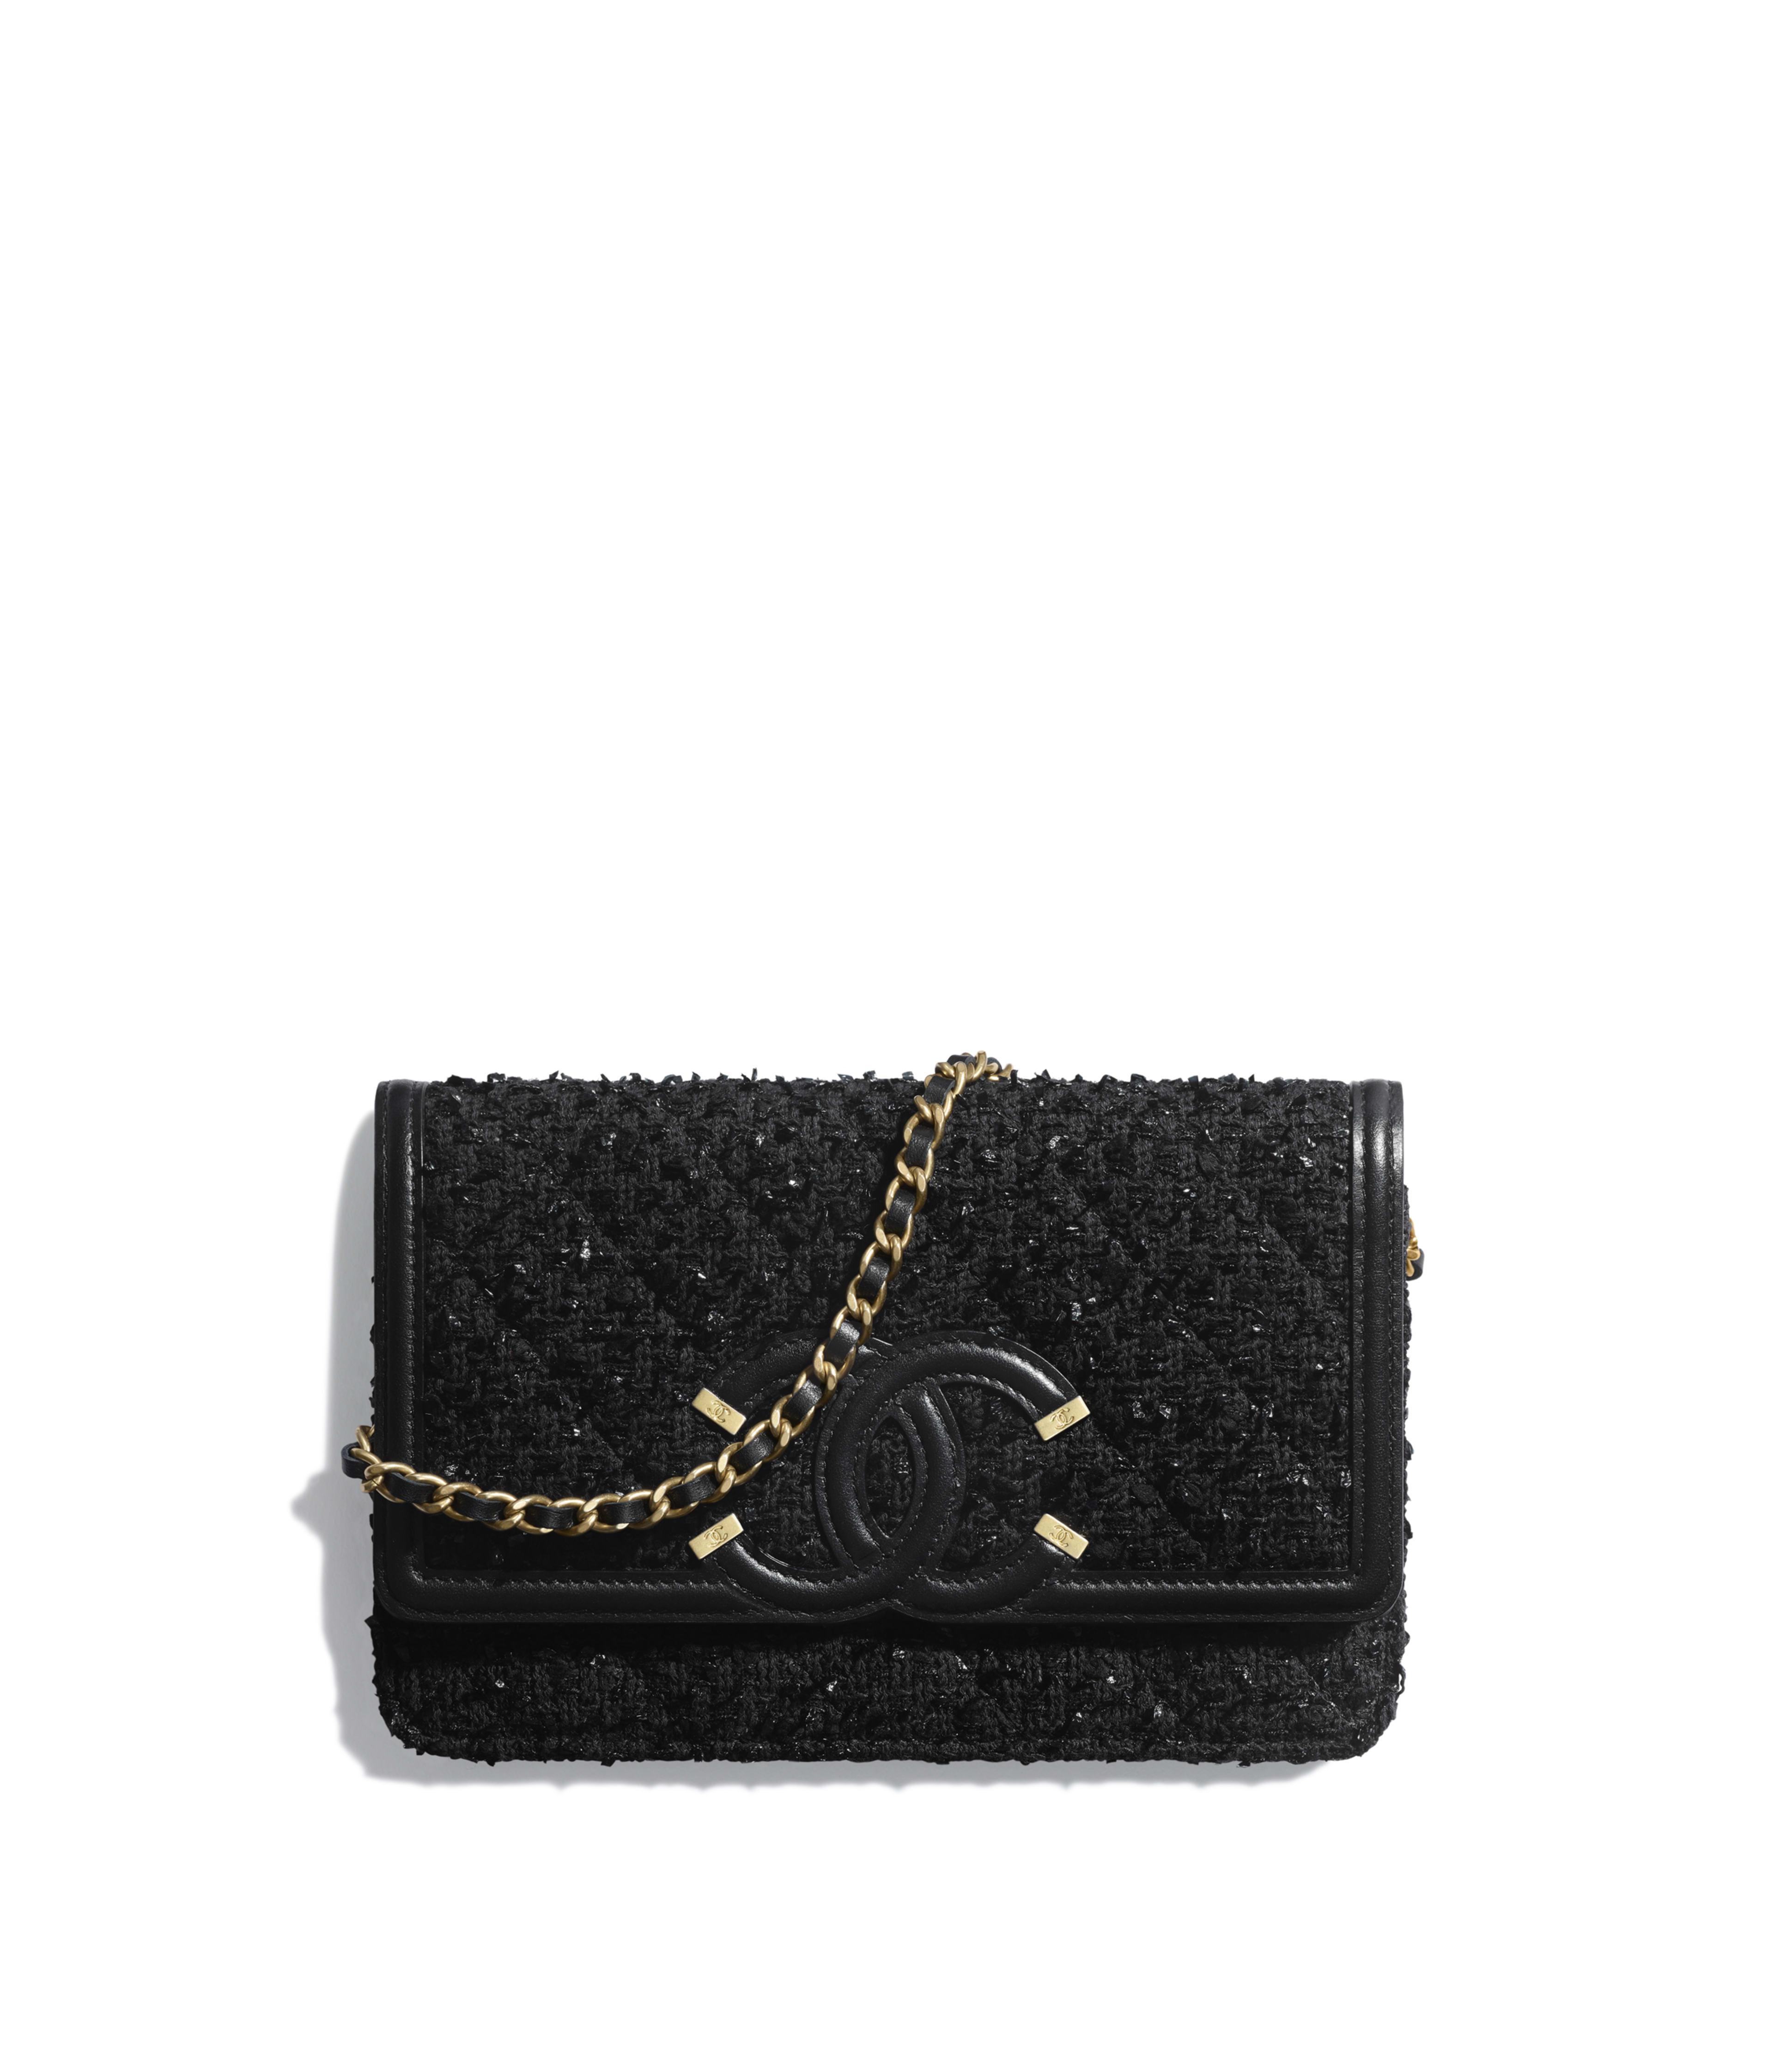 c0d9871bfa7e Wallet on Chain Tweed, Calfskin & Gold-Tone Metal, Black Ref.  A84451B0040894305